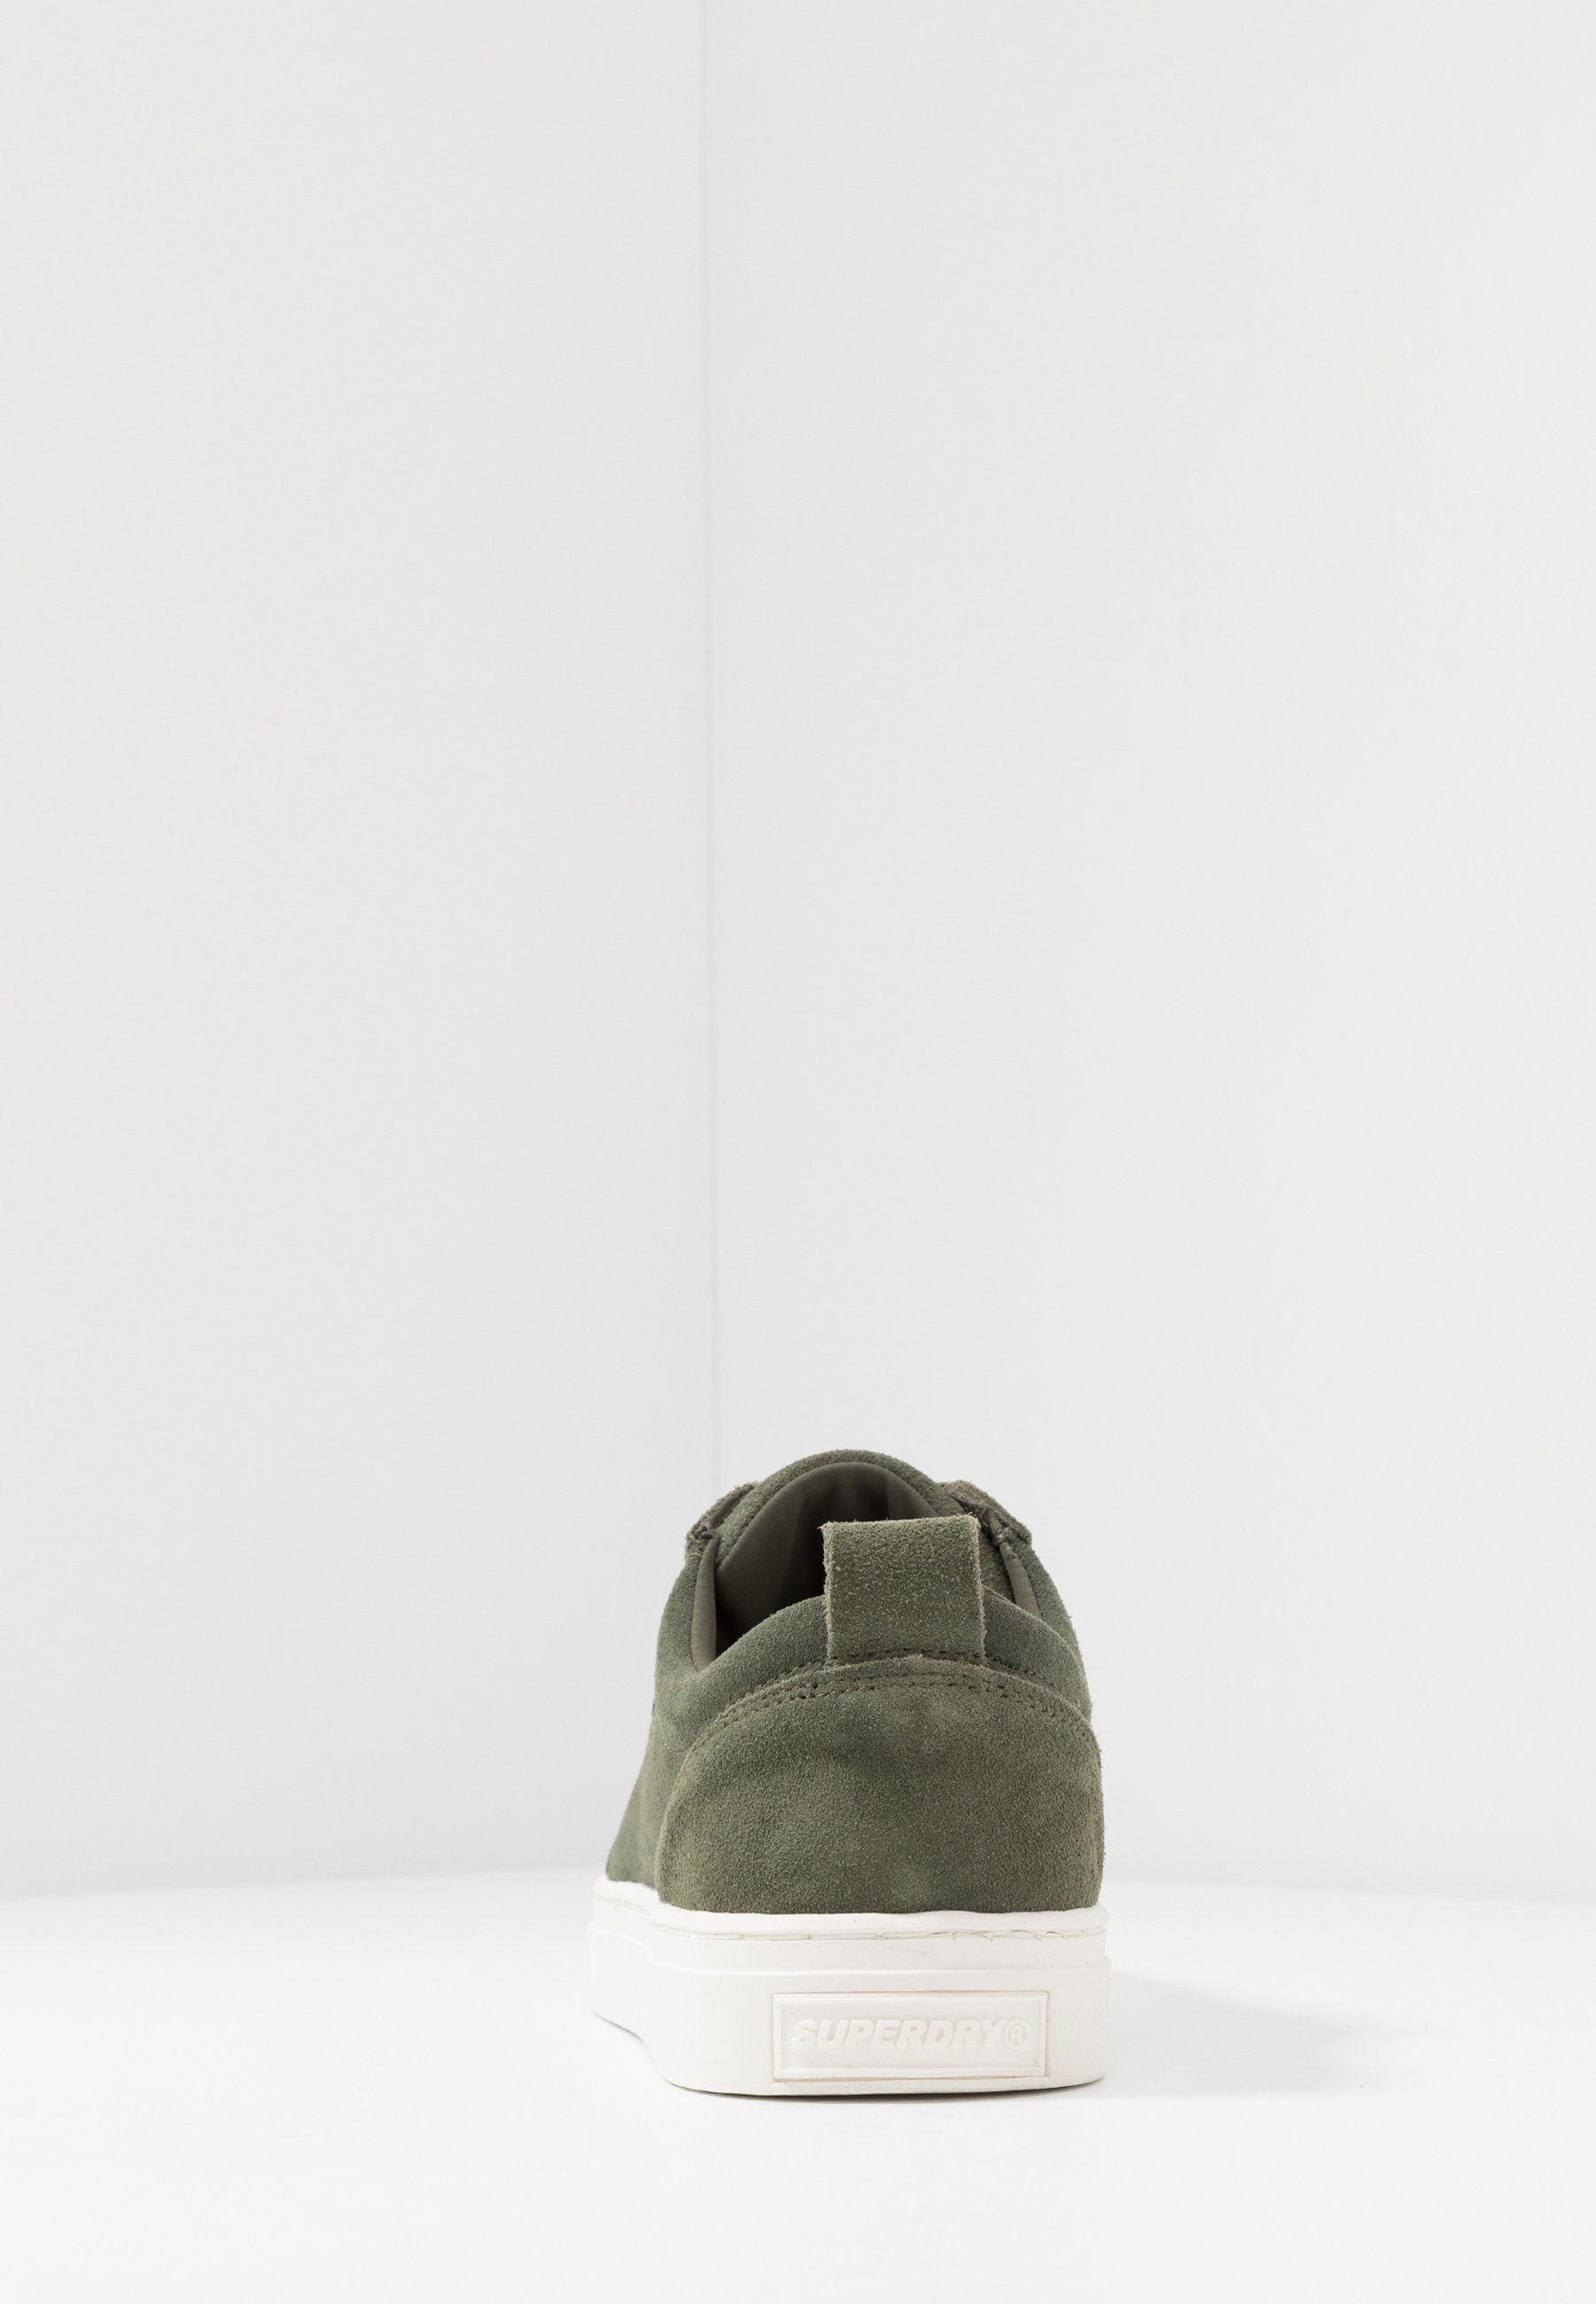 Superdry Truman Premium - Sneakers Laag Khaki Goedkope Schoenen